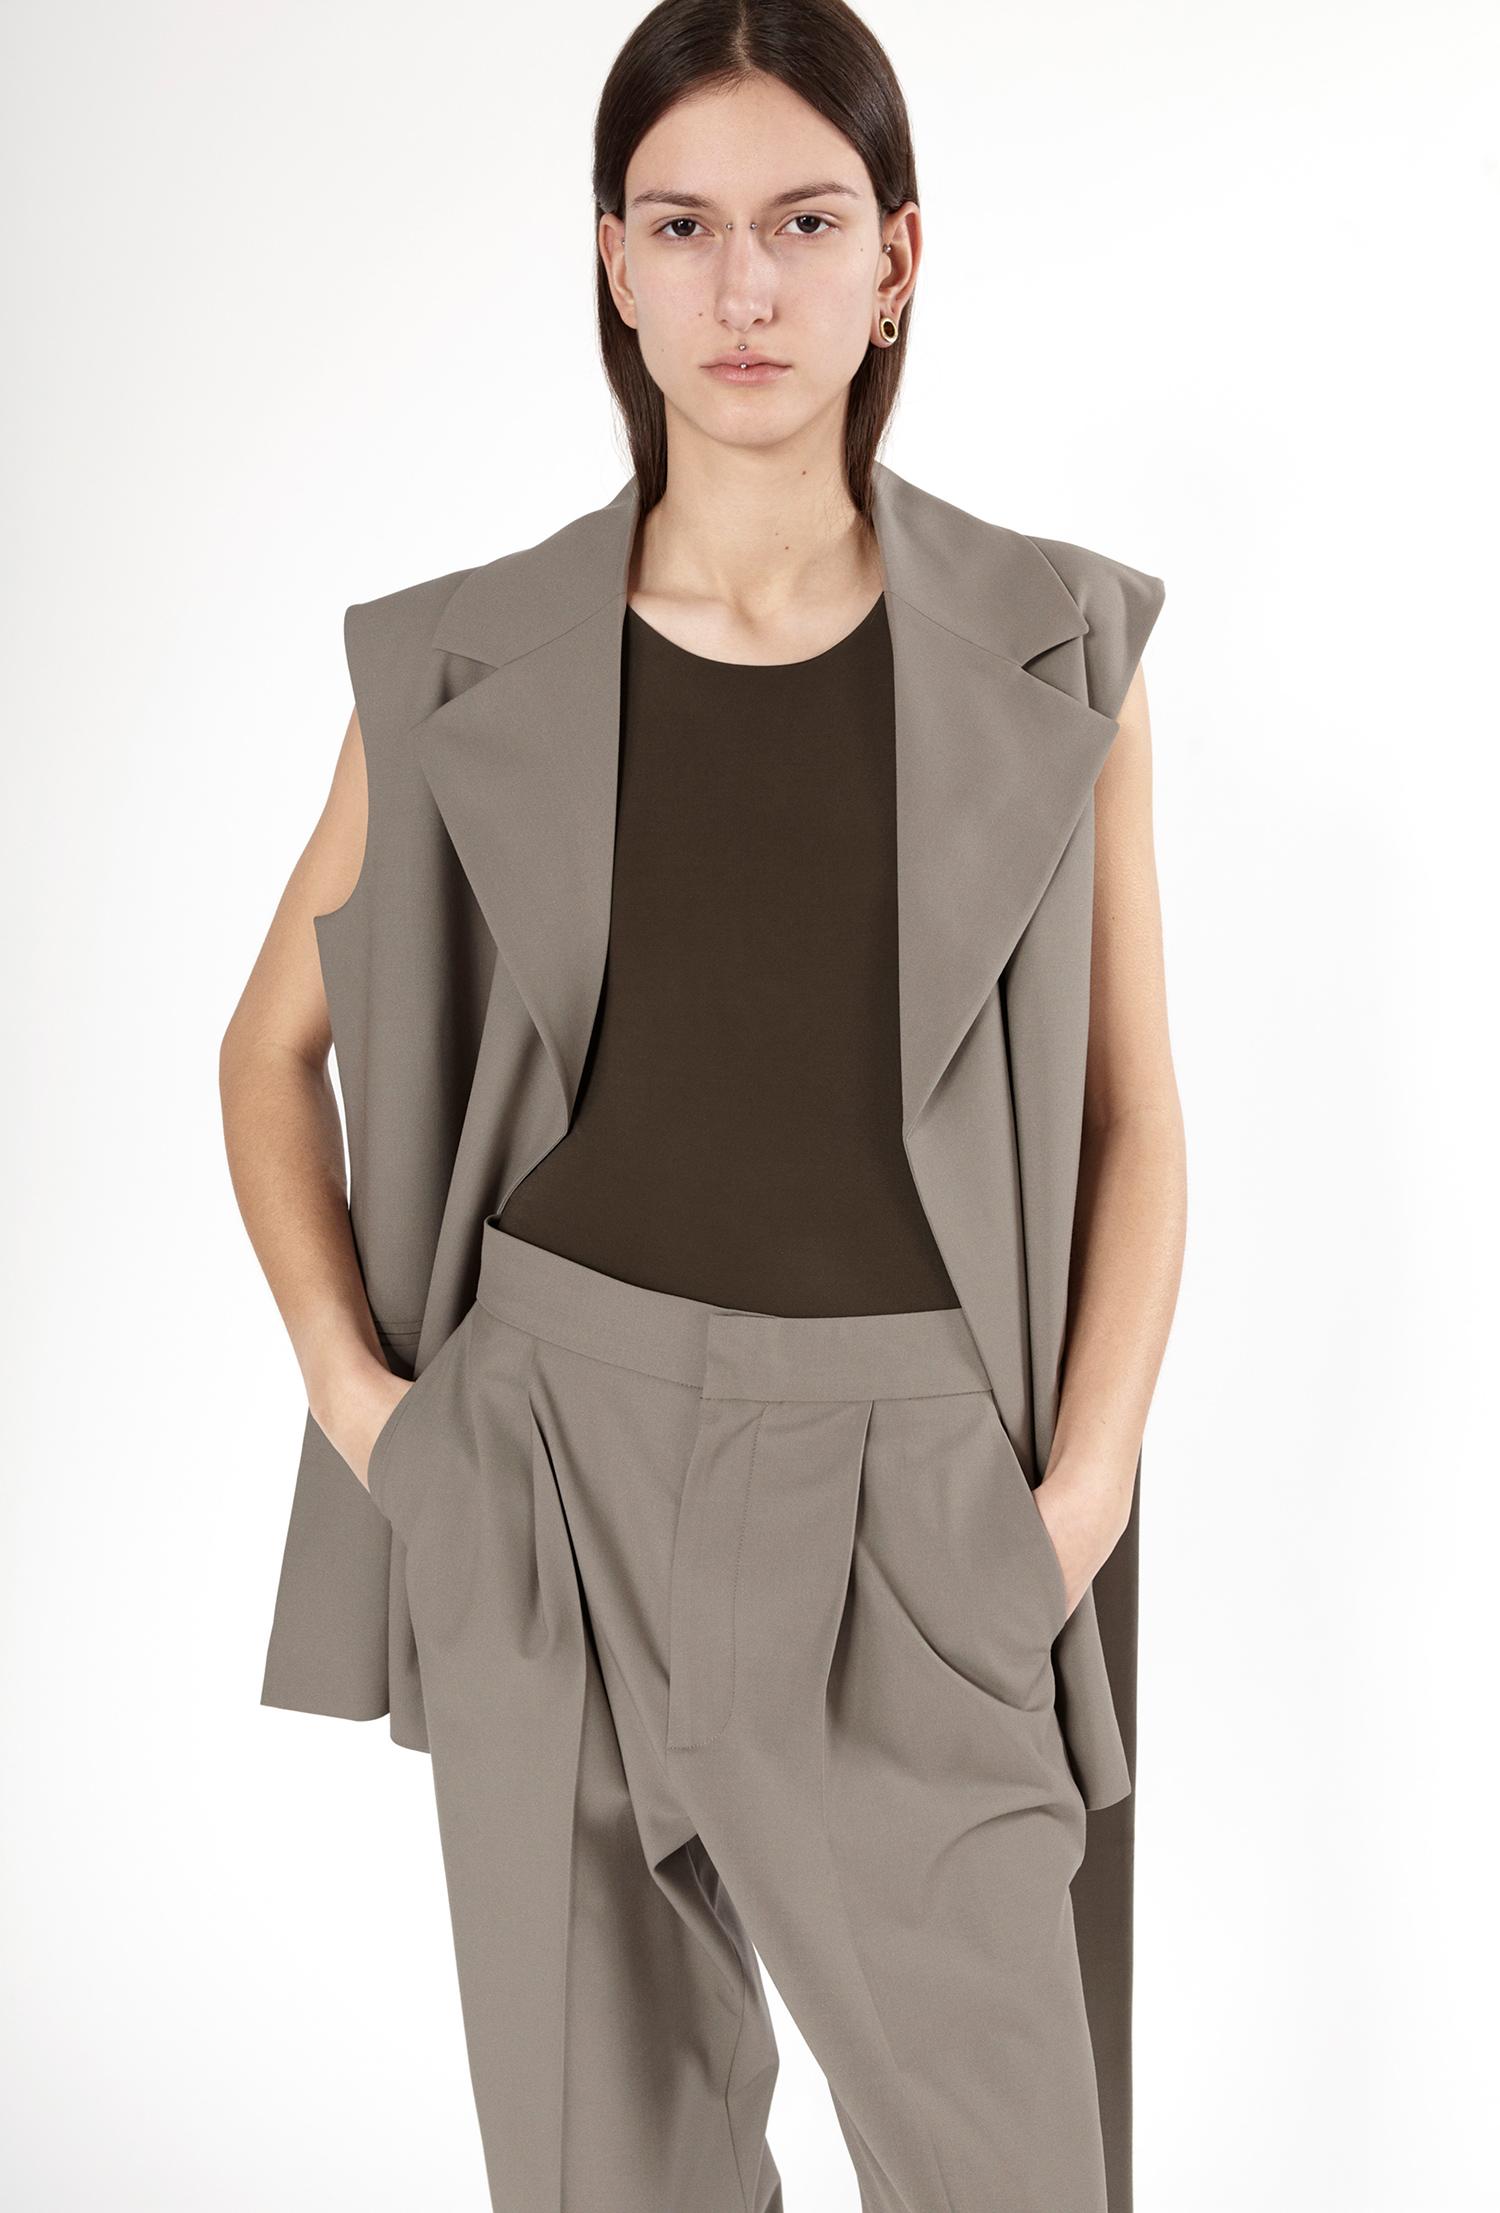 Top ROSY Jacket ROMIE Trousers RANHA